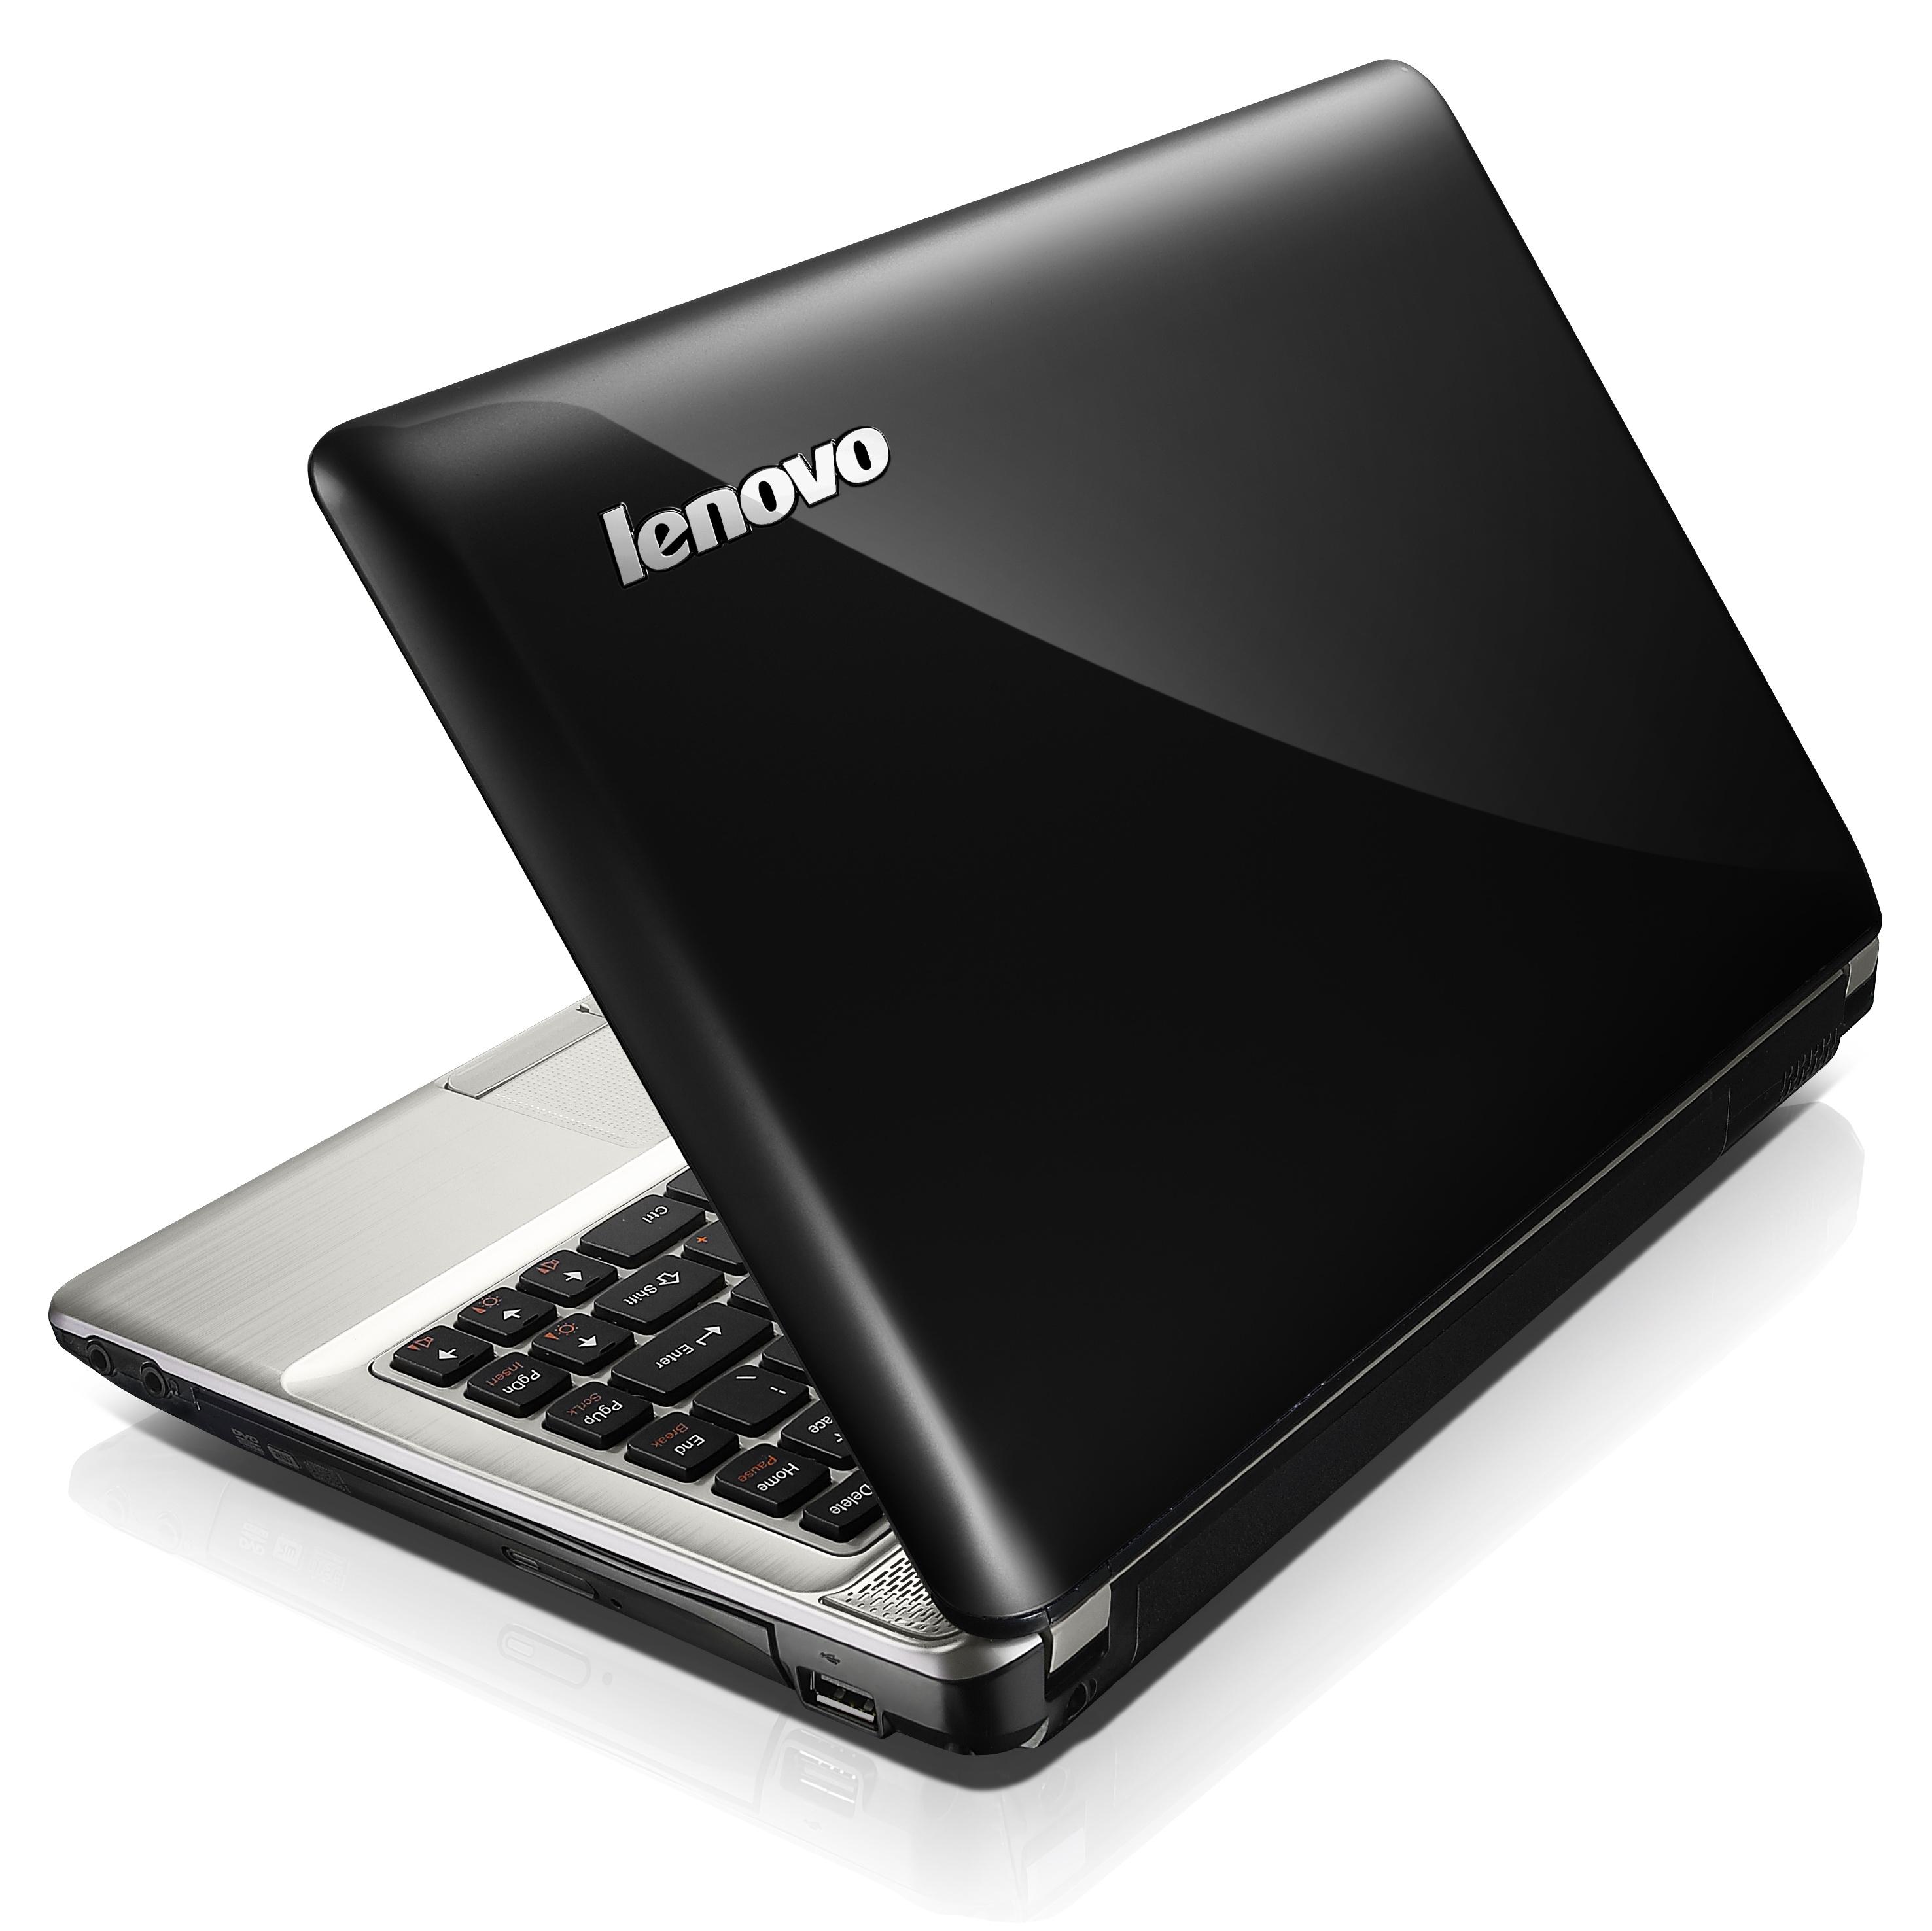 Lenovo聯想影音機種IdeaPad Y560及Z360 「超大」升級